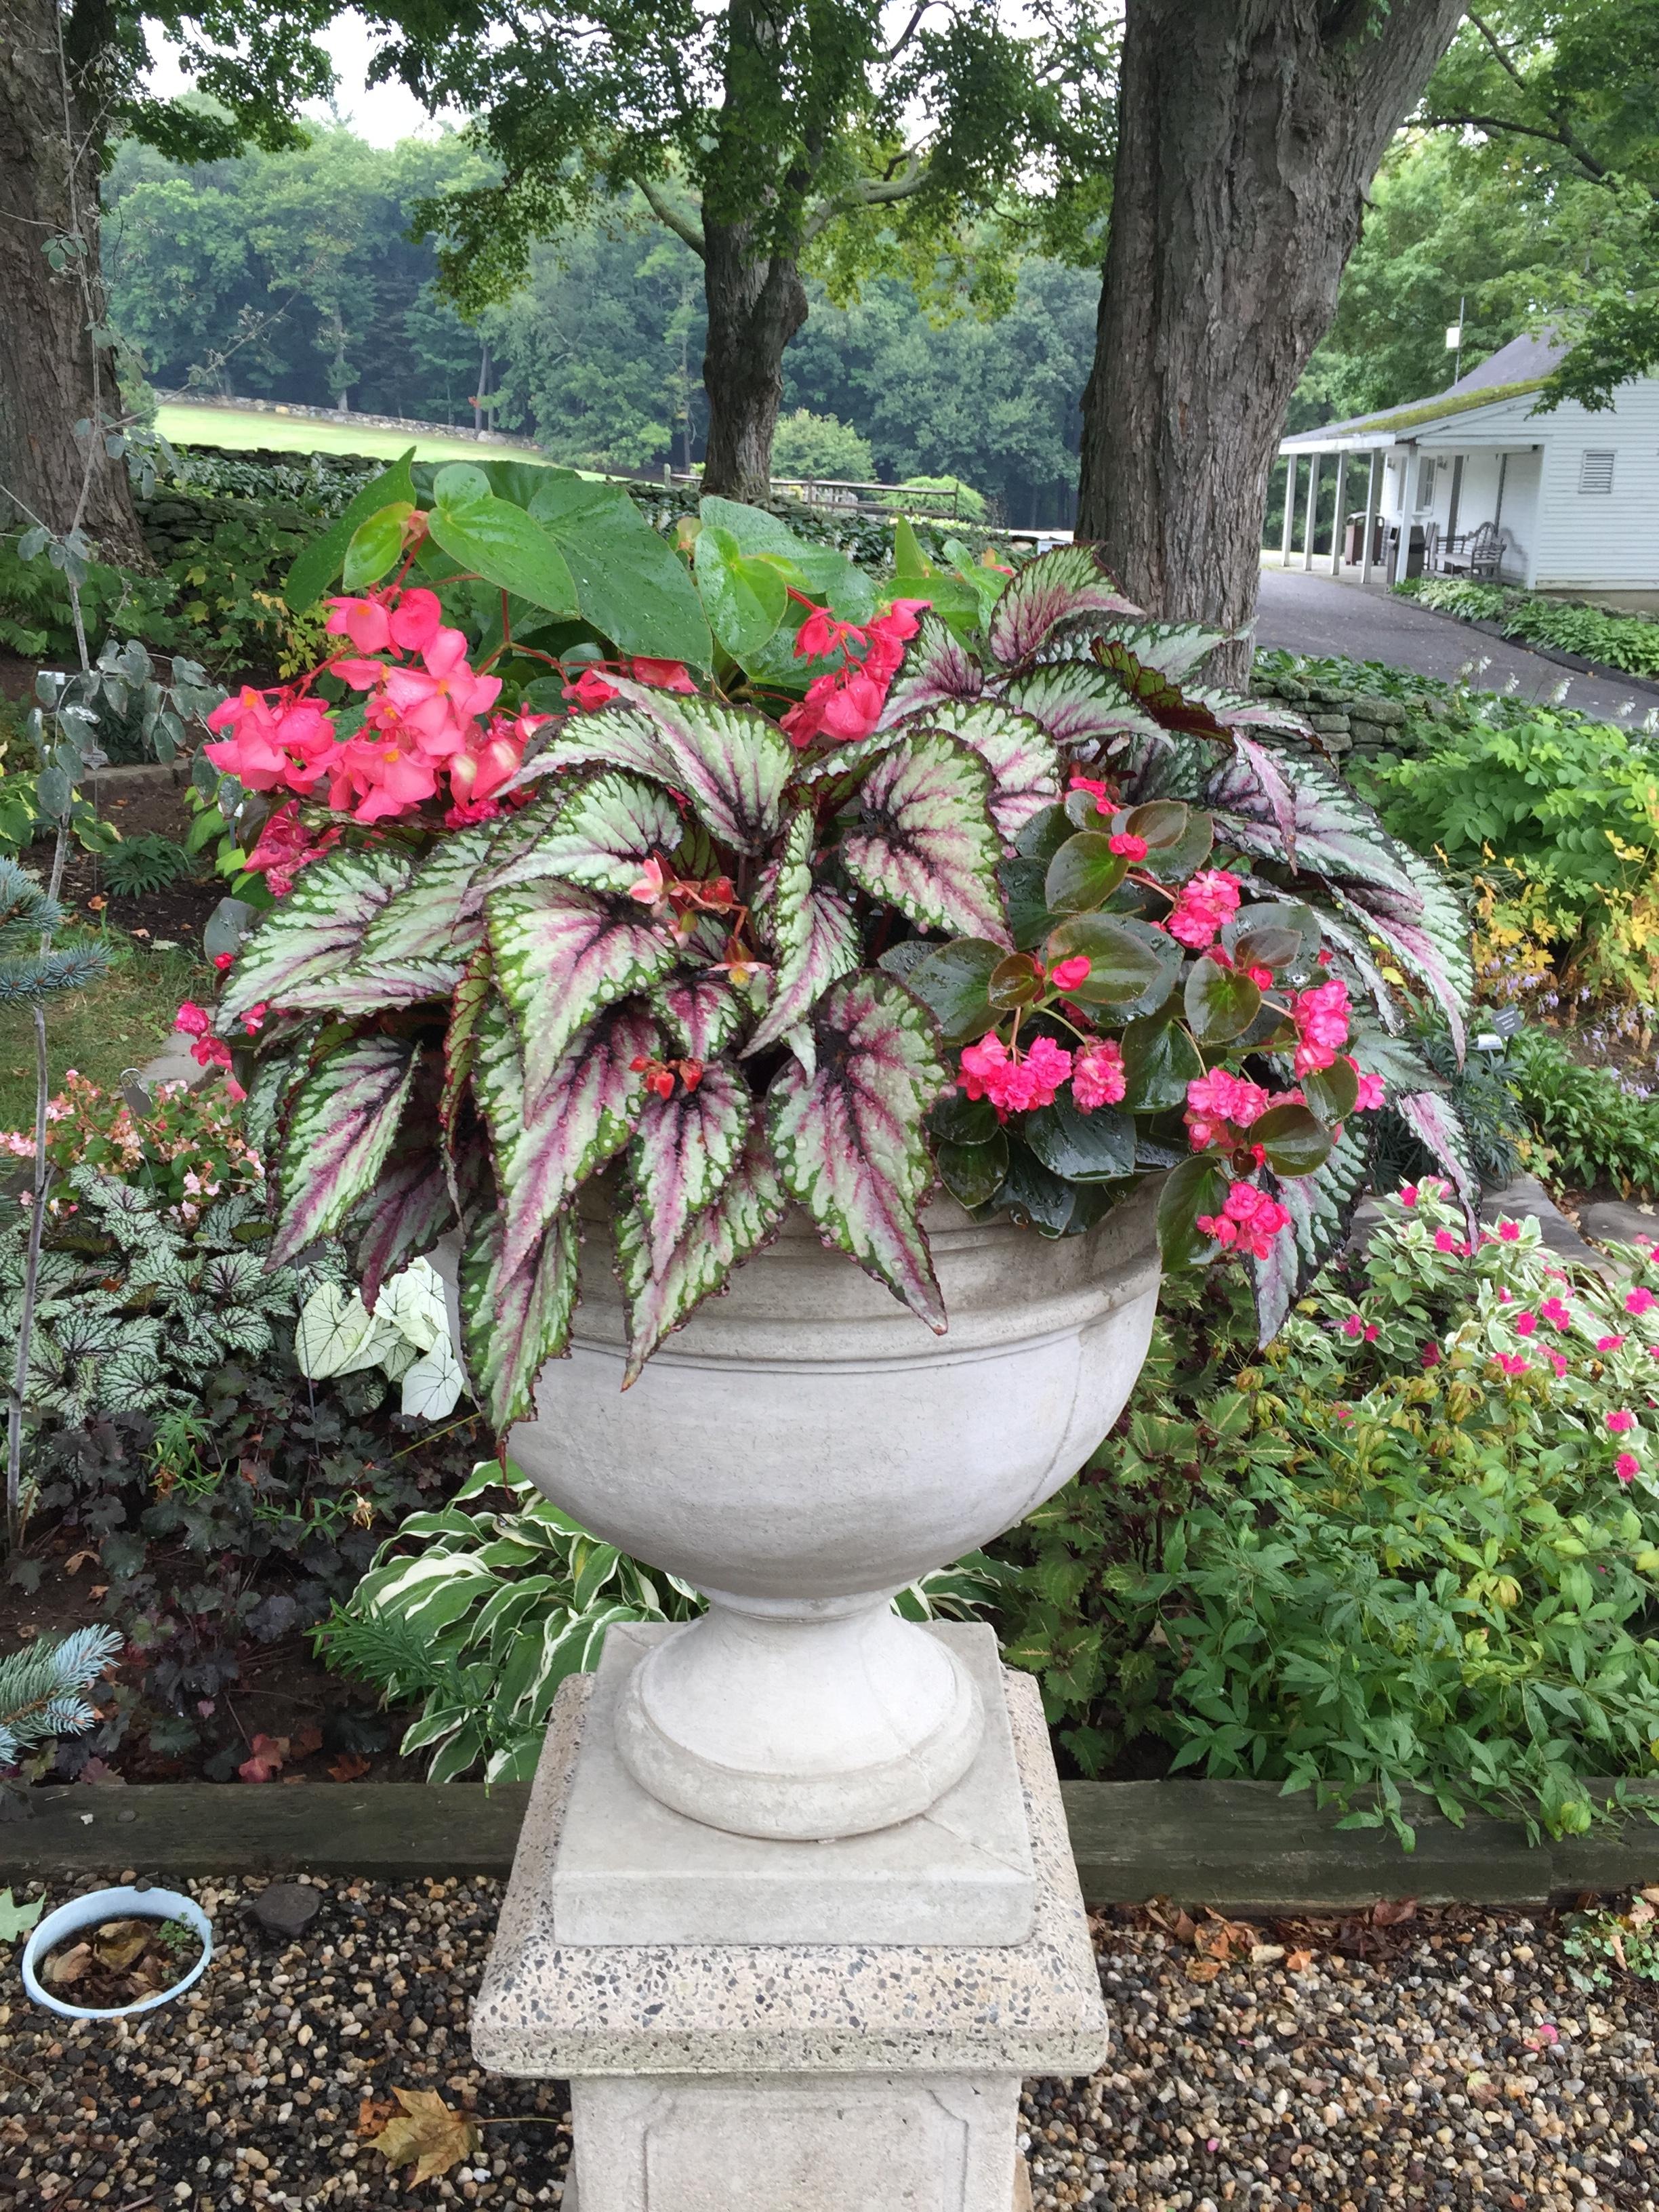 Campania Montgomery Urn with Begonia rex Salsa, Begonia Gumdrop Coco Rose, and Begonia Dragon Wing Pink